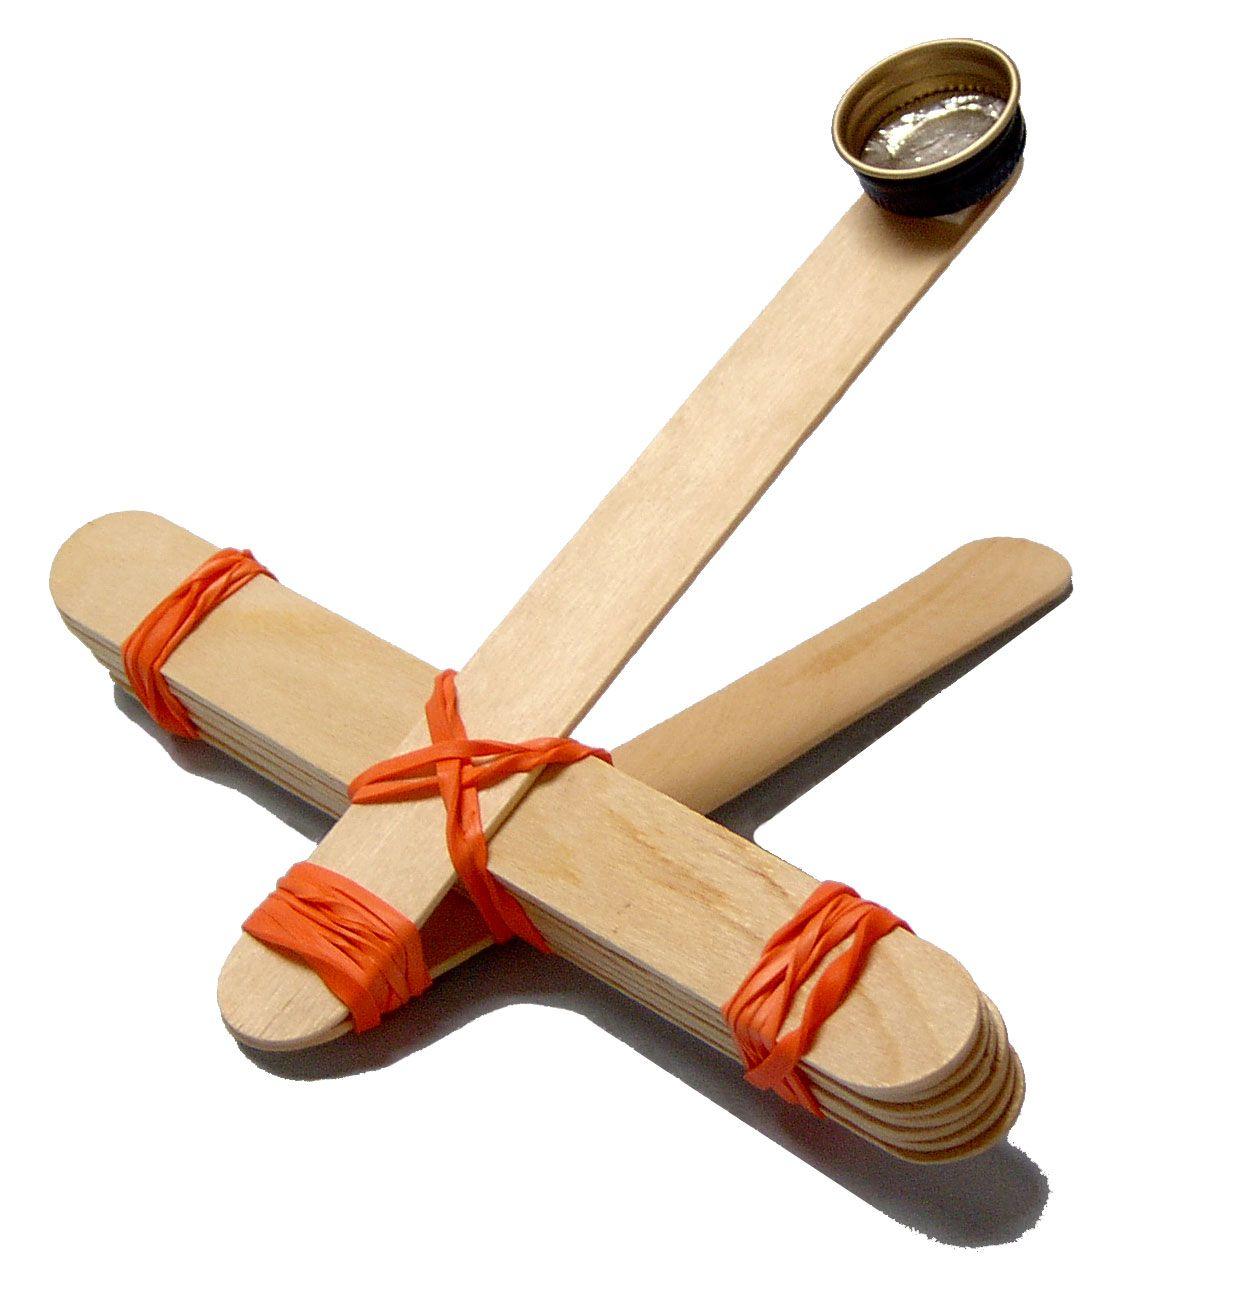 Popsicle Stick Crafts Including A Catapult Reindeer